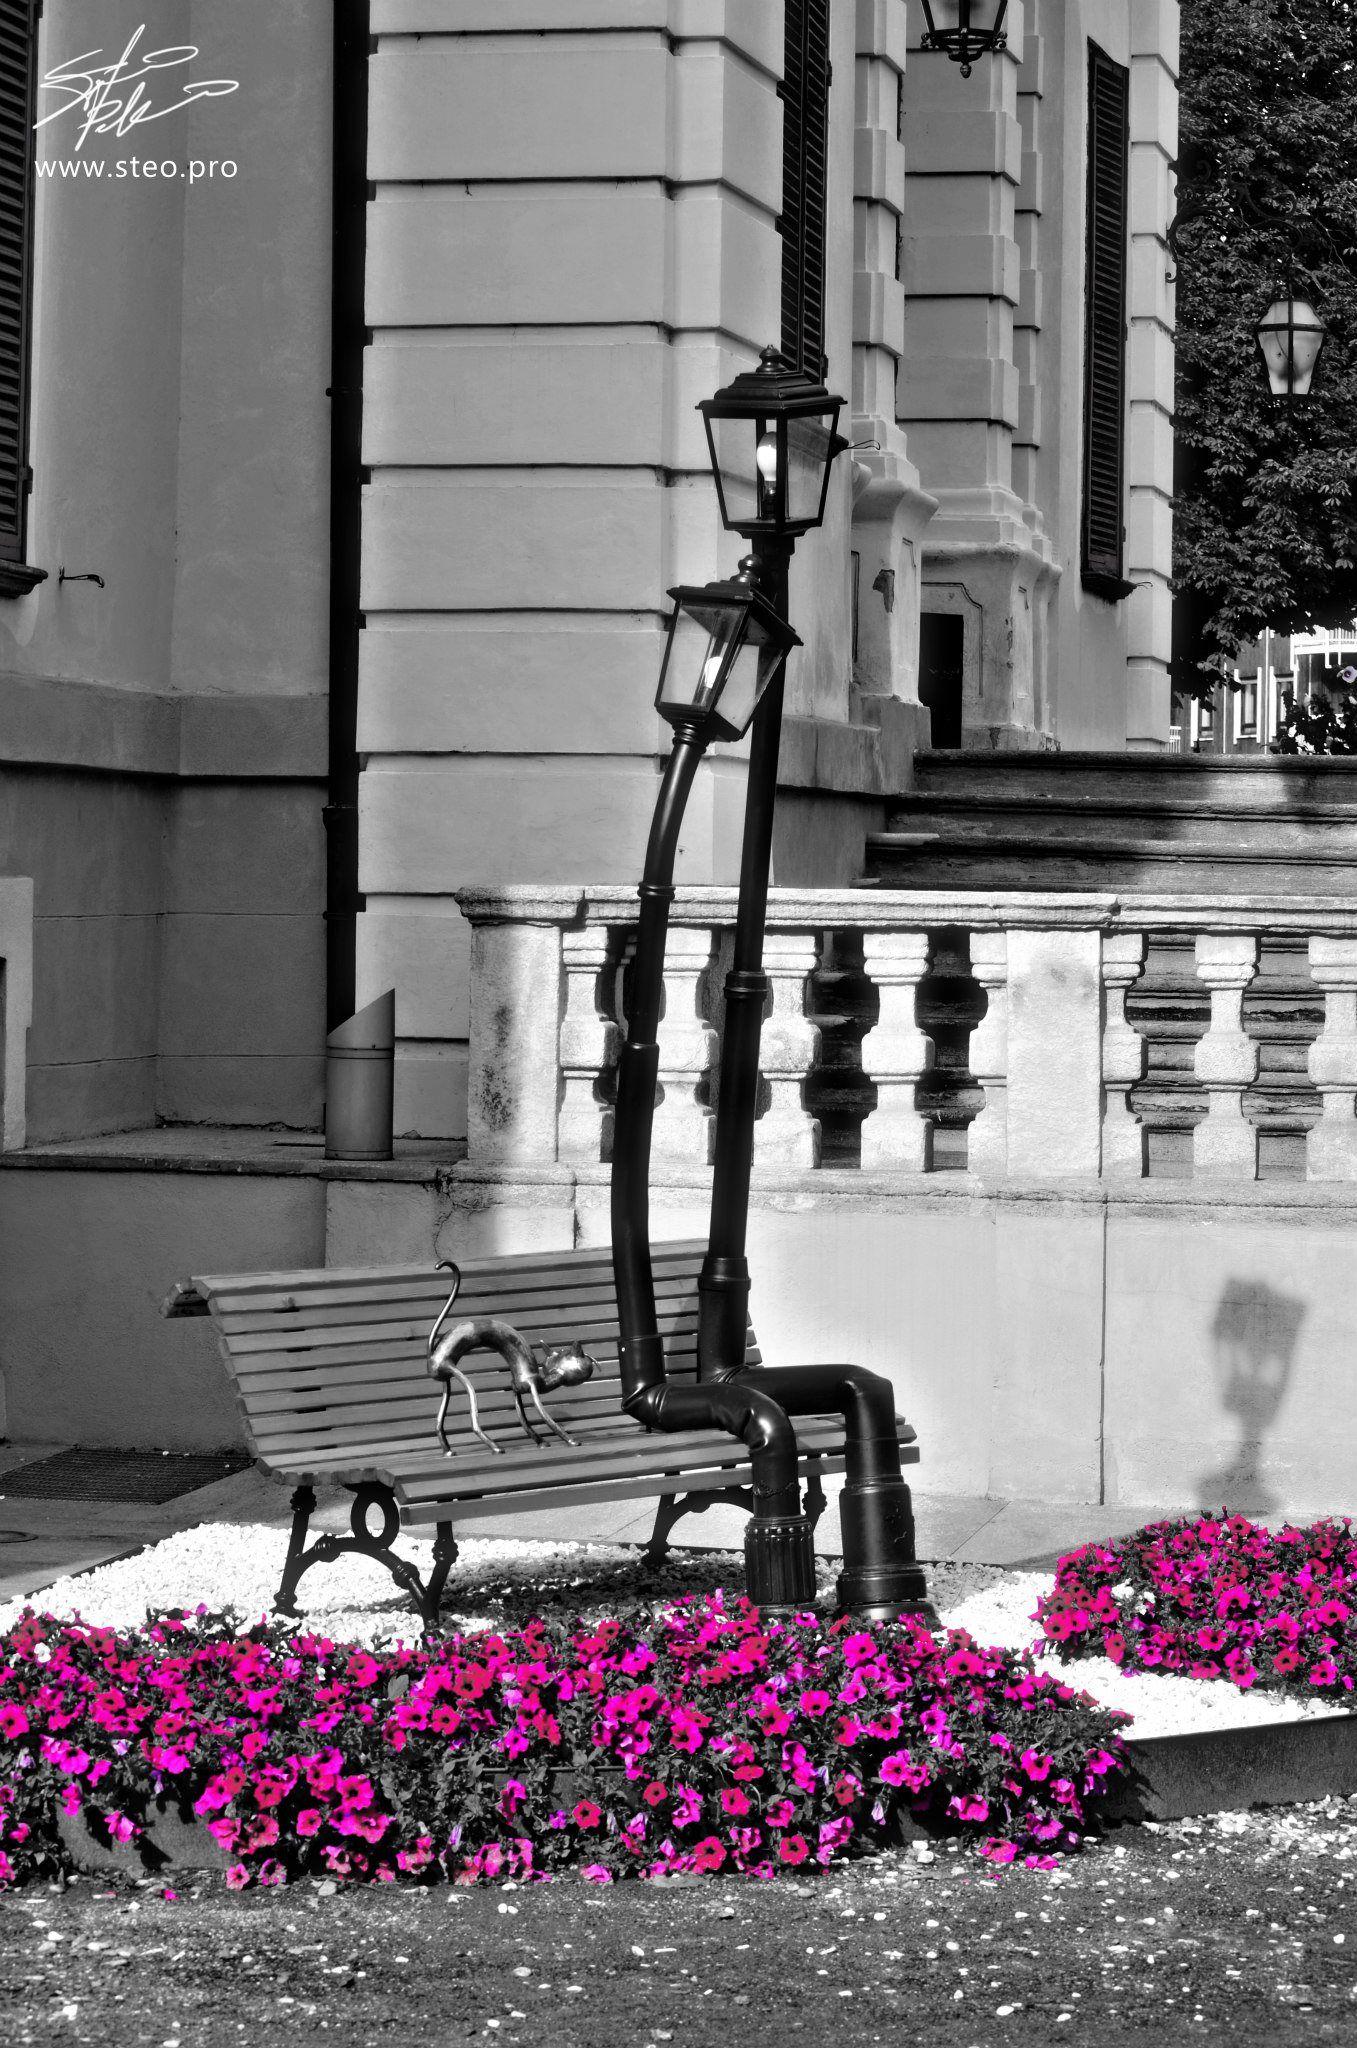 Lampioni Innamorati Streetlights In Love Paesaggi Torino Spruzzi Di Colore